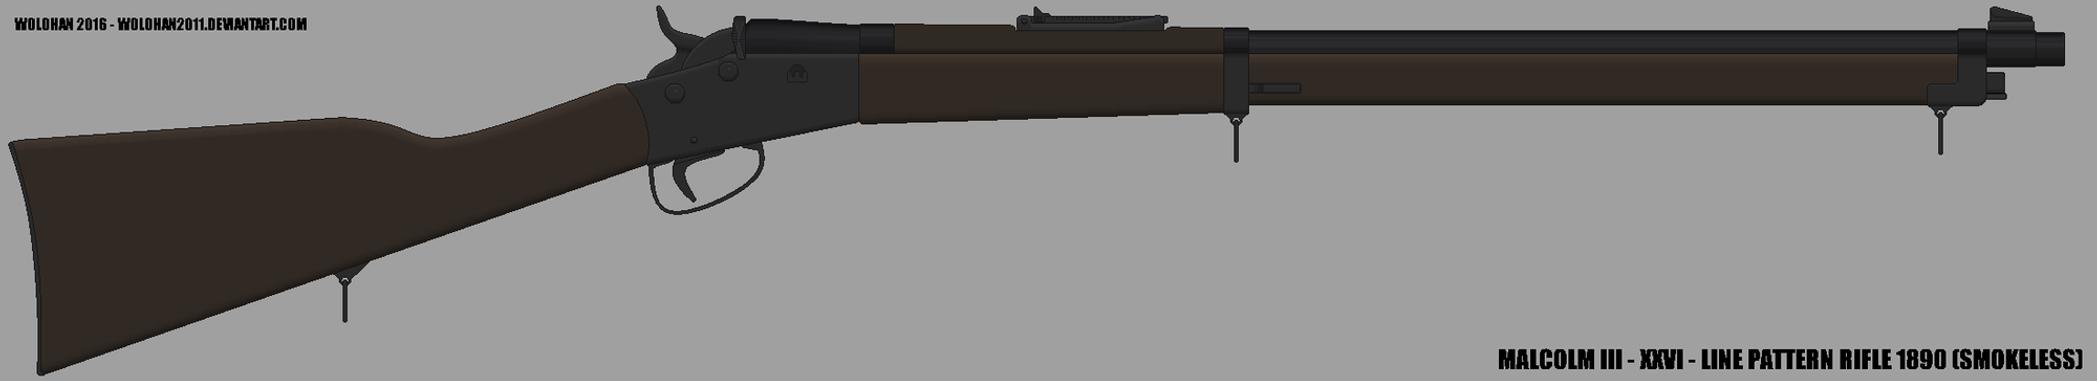 Malcom III - XXVI - Line Pattern Rifle (Smokeless) by Wolohan2011